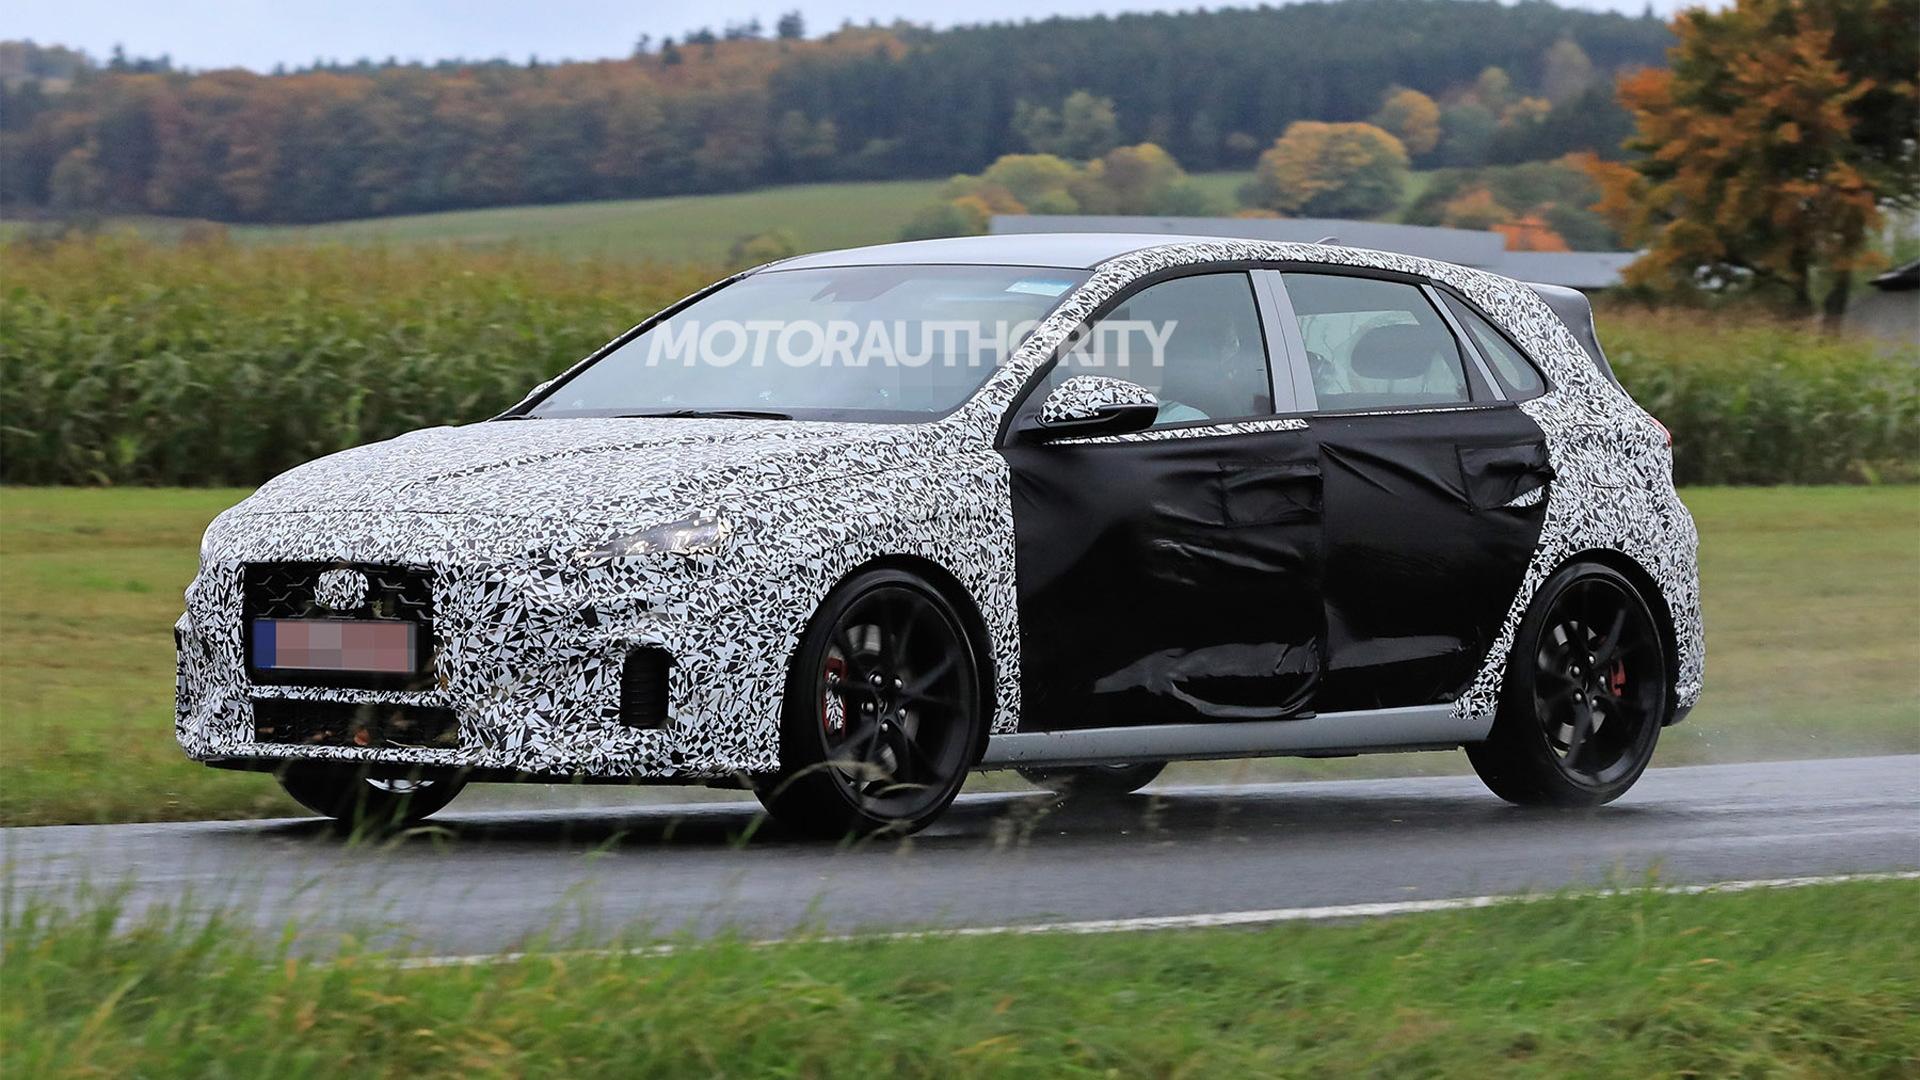 2021 Hyundai i30 N facelift spy shots - Photo credit: S. Baldauf/SB-Medien